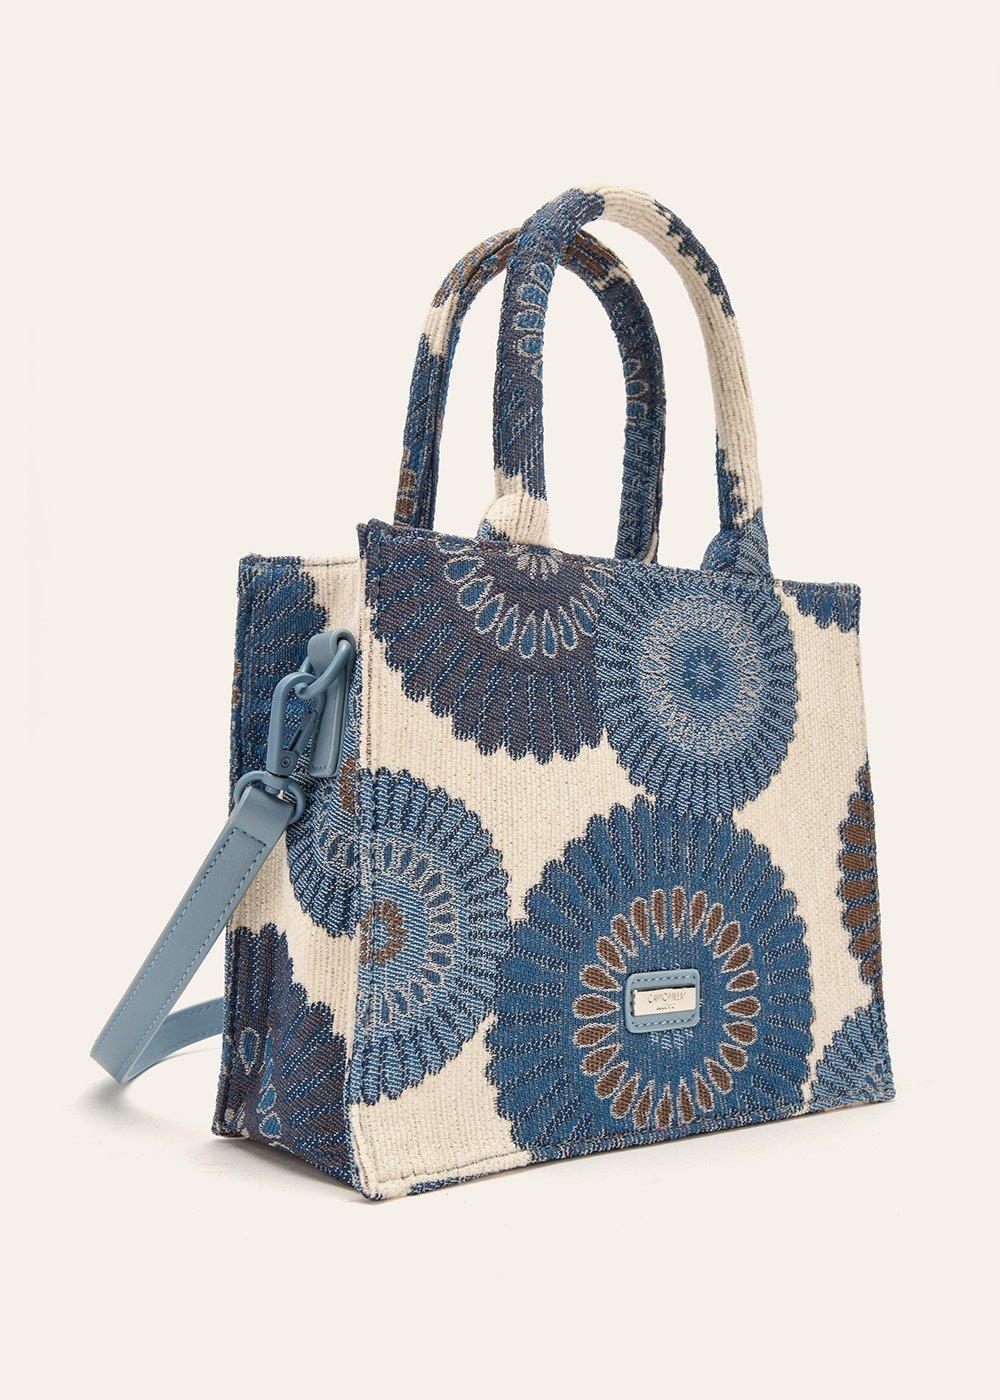 Brandy mini jacquard bag - Avion Fantasia - Woman